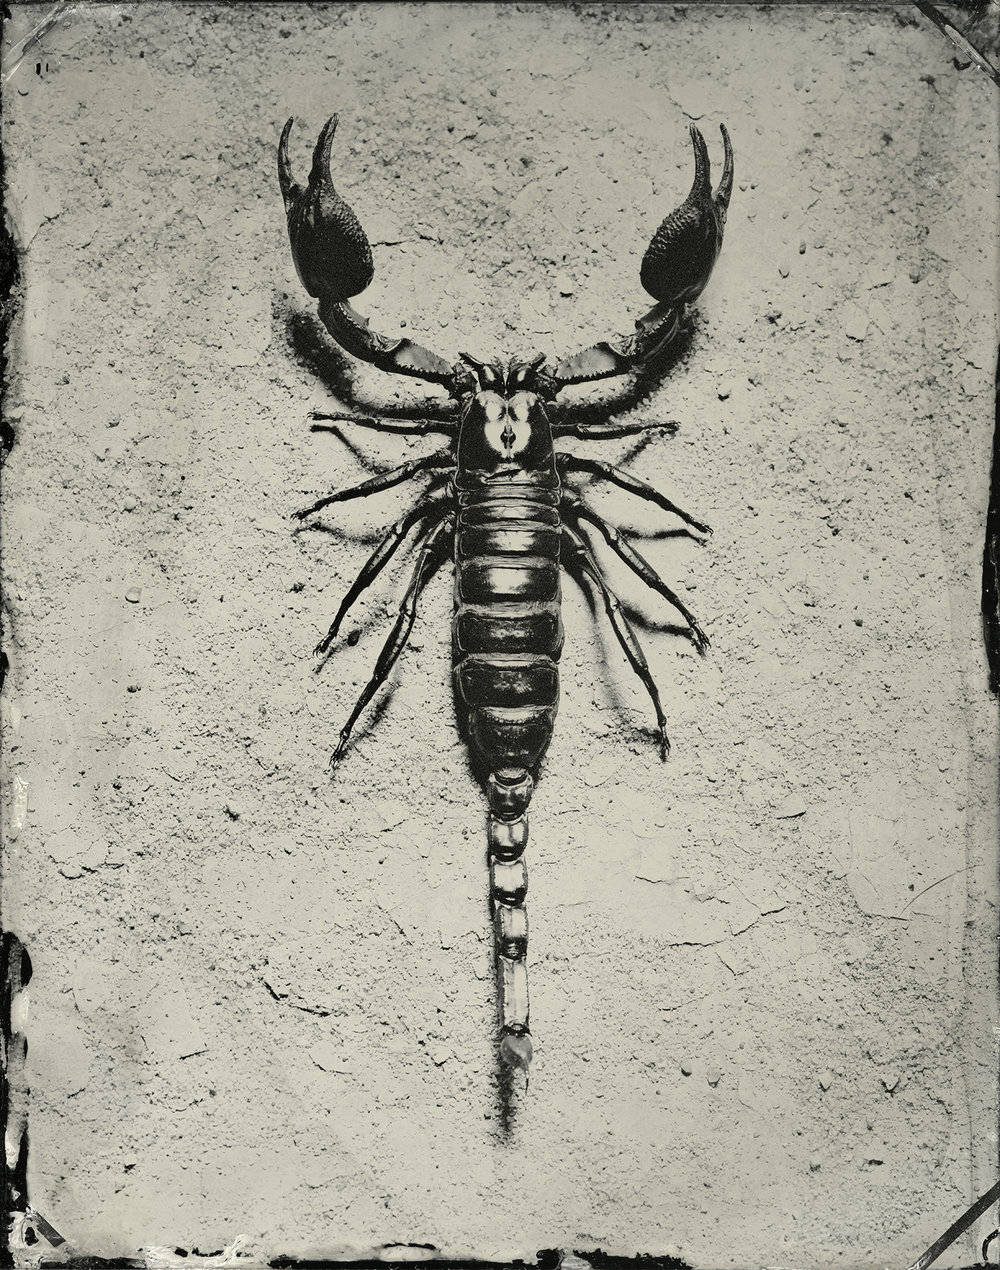 24x30_scorpion_sec.jpg